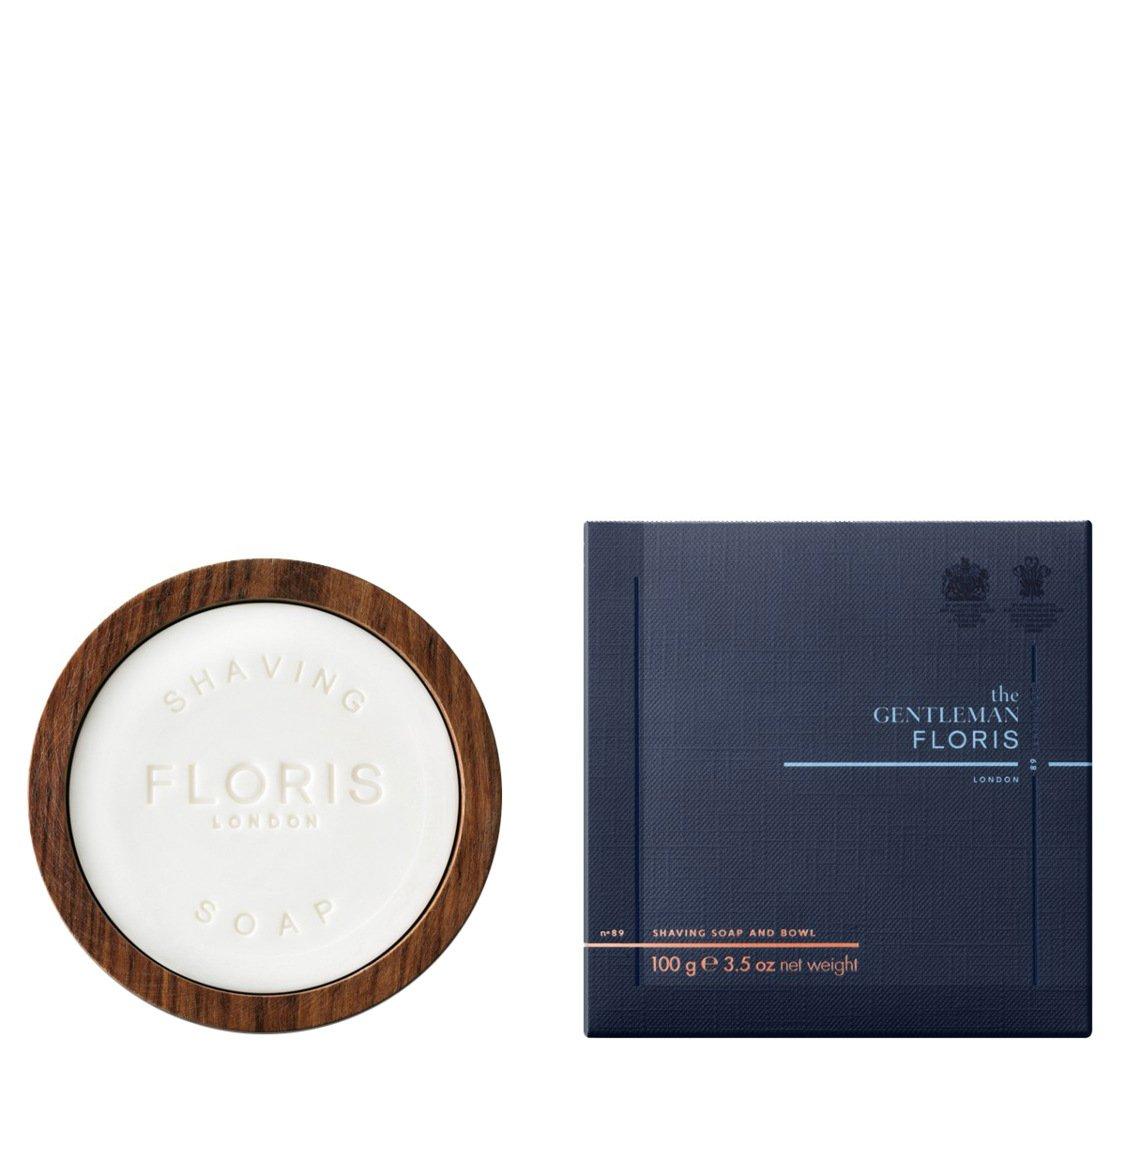 Floris London No. 89 Shaving Soap And Bowl 100g